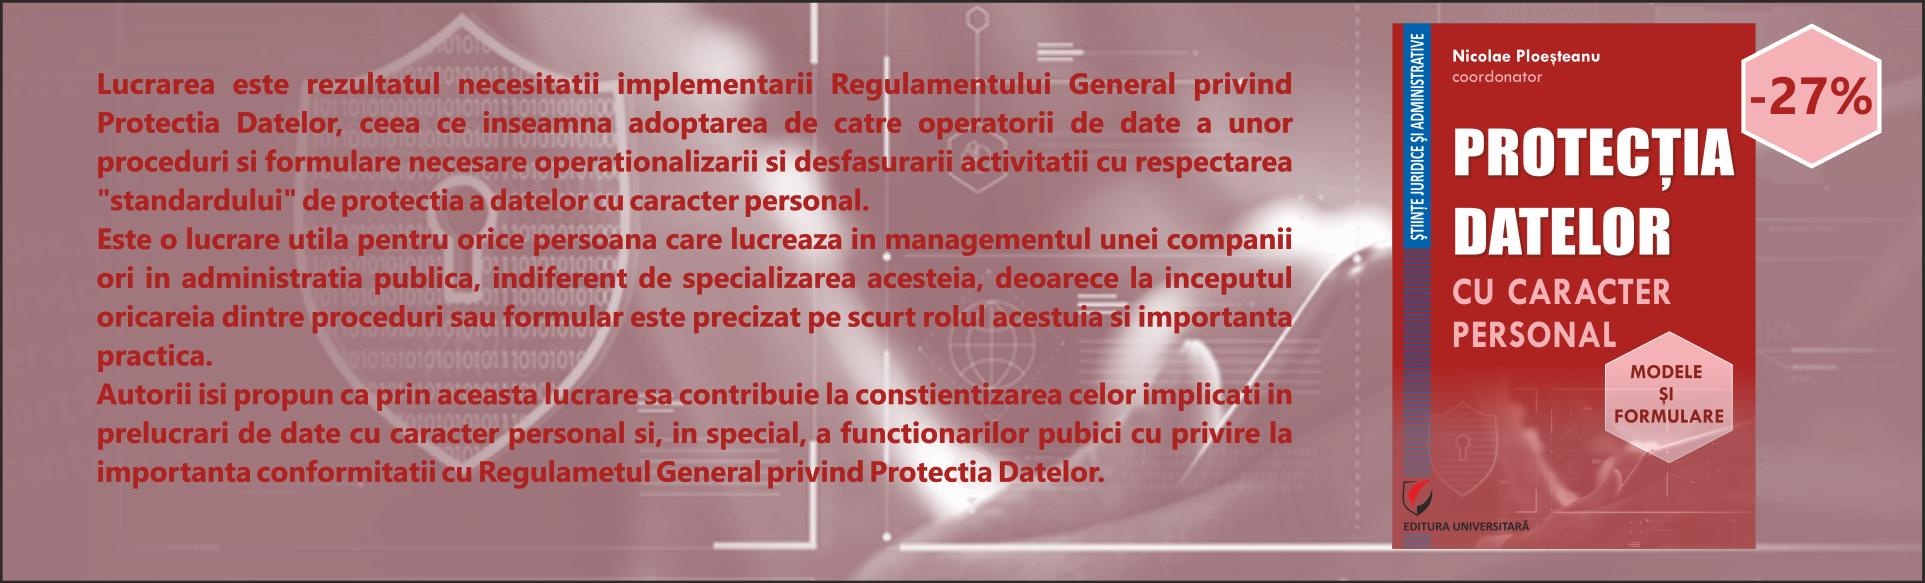 Homepage_9_Protectia_Modele